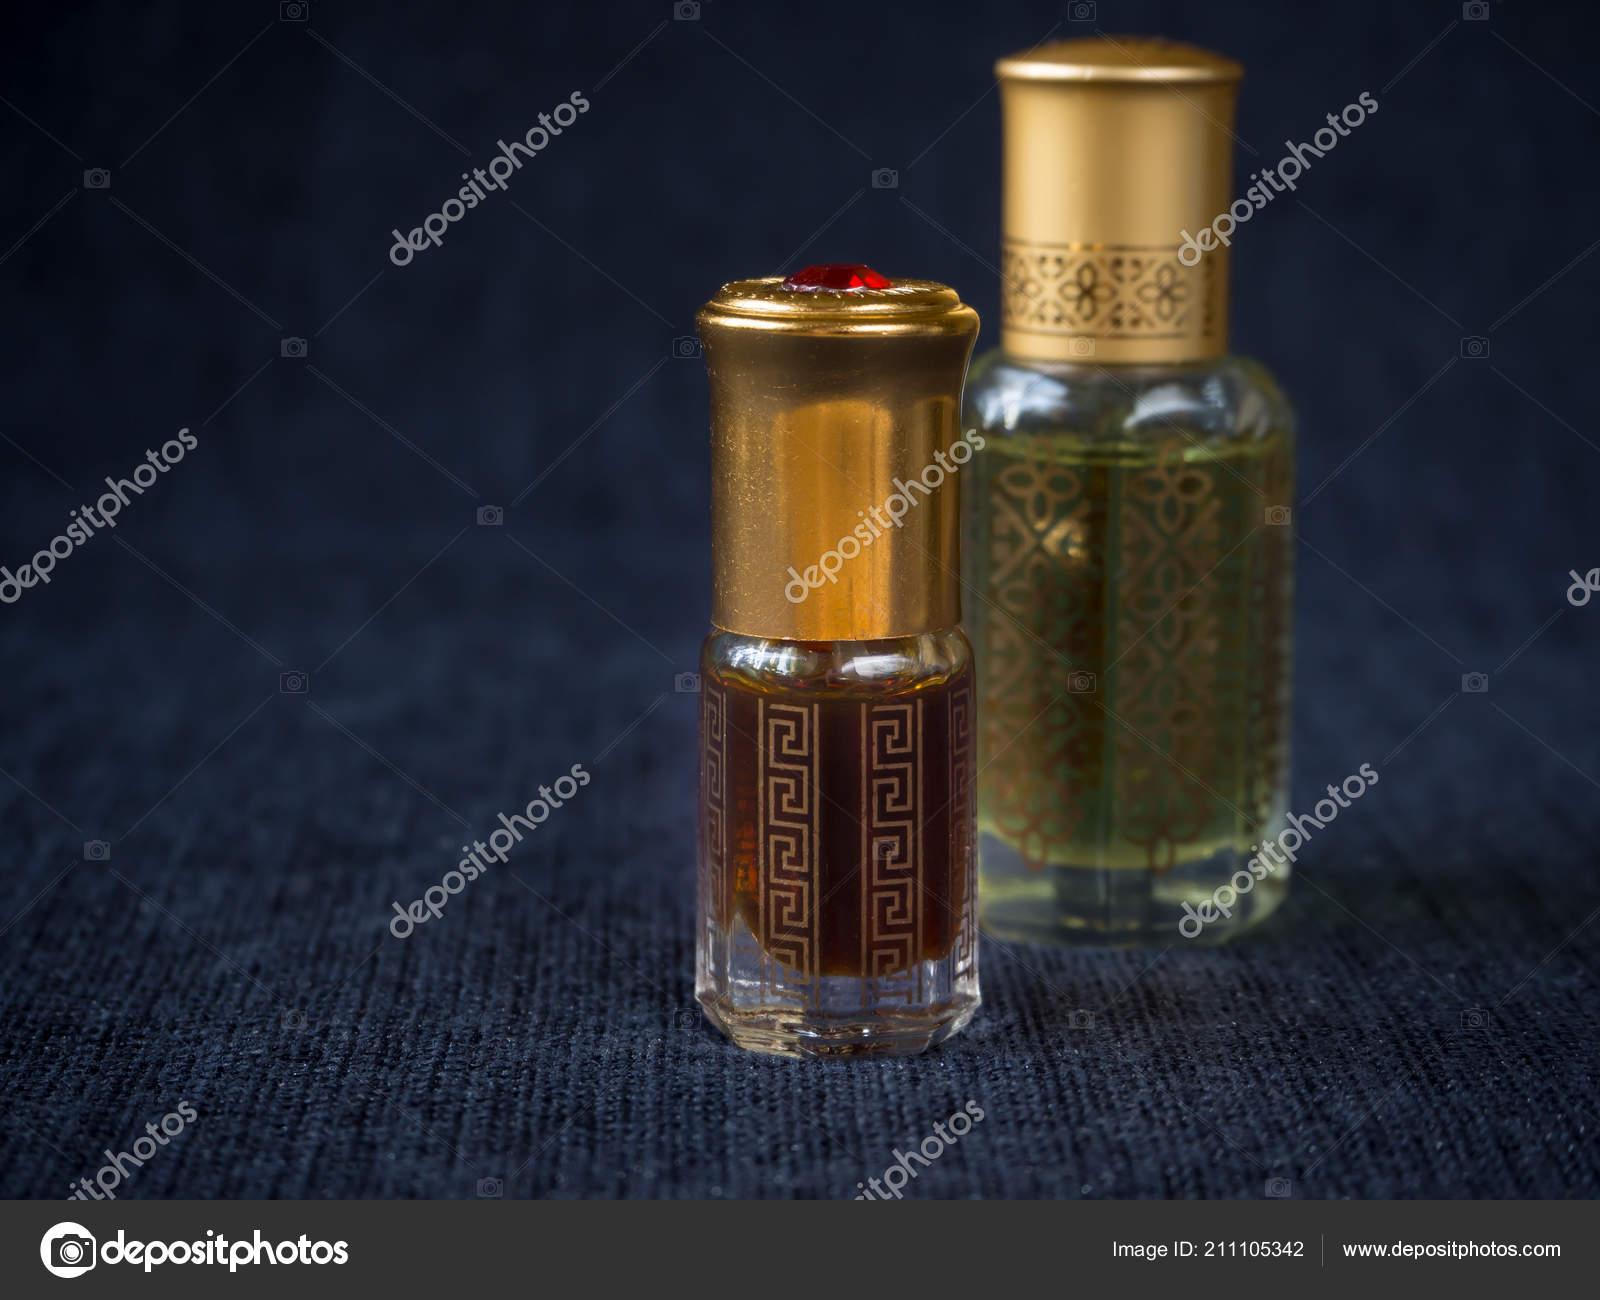 Arabian oud attar perfume or agarwood oil fragrances in mini